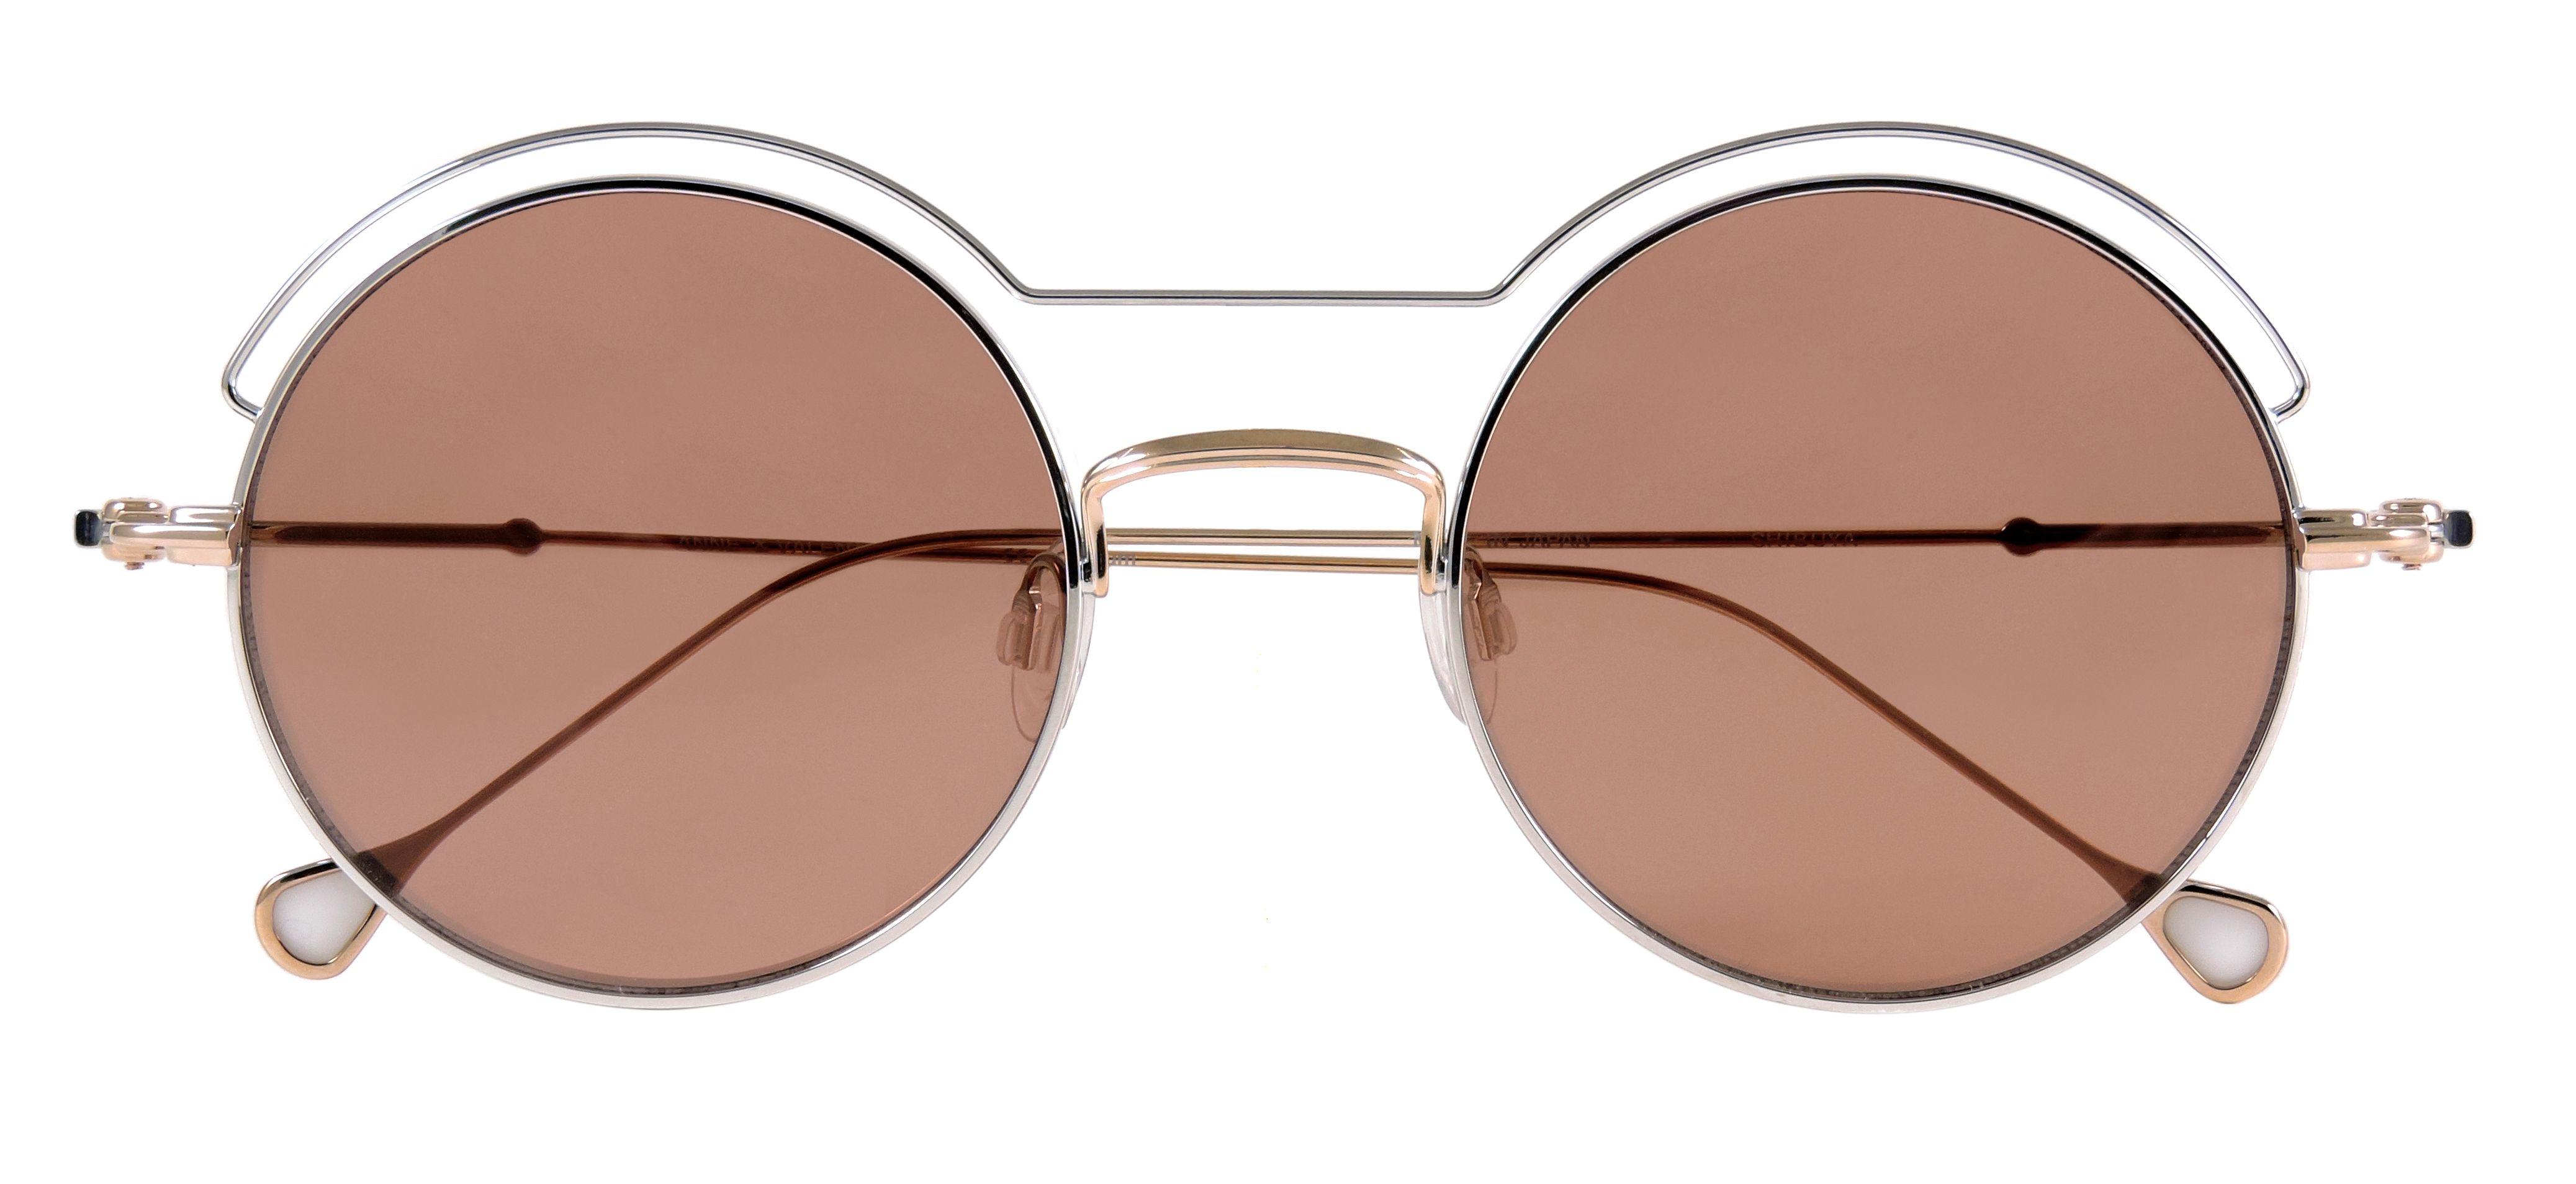 976e6bbe7d0 Discover the brand  anneetvalentin on Amazing Eyewear!